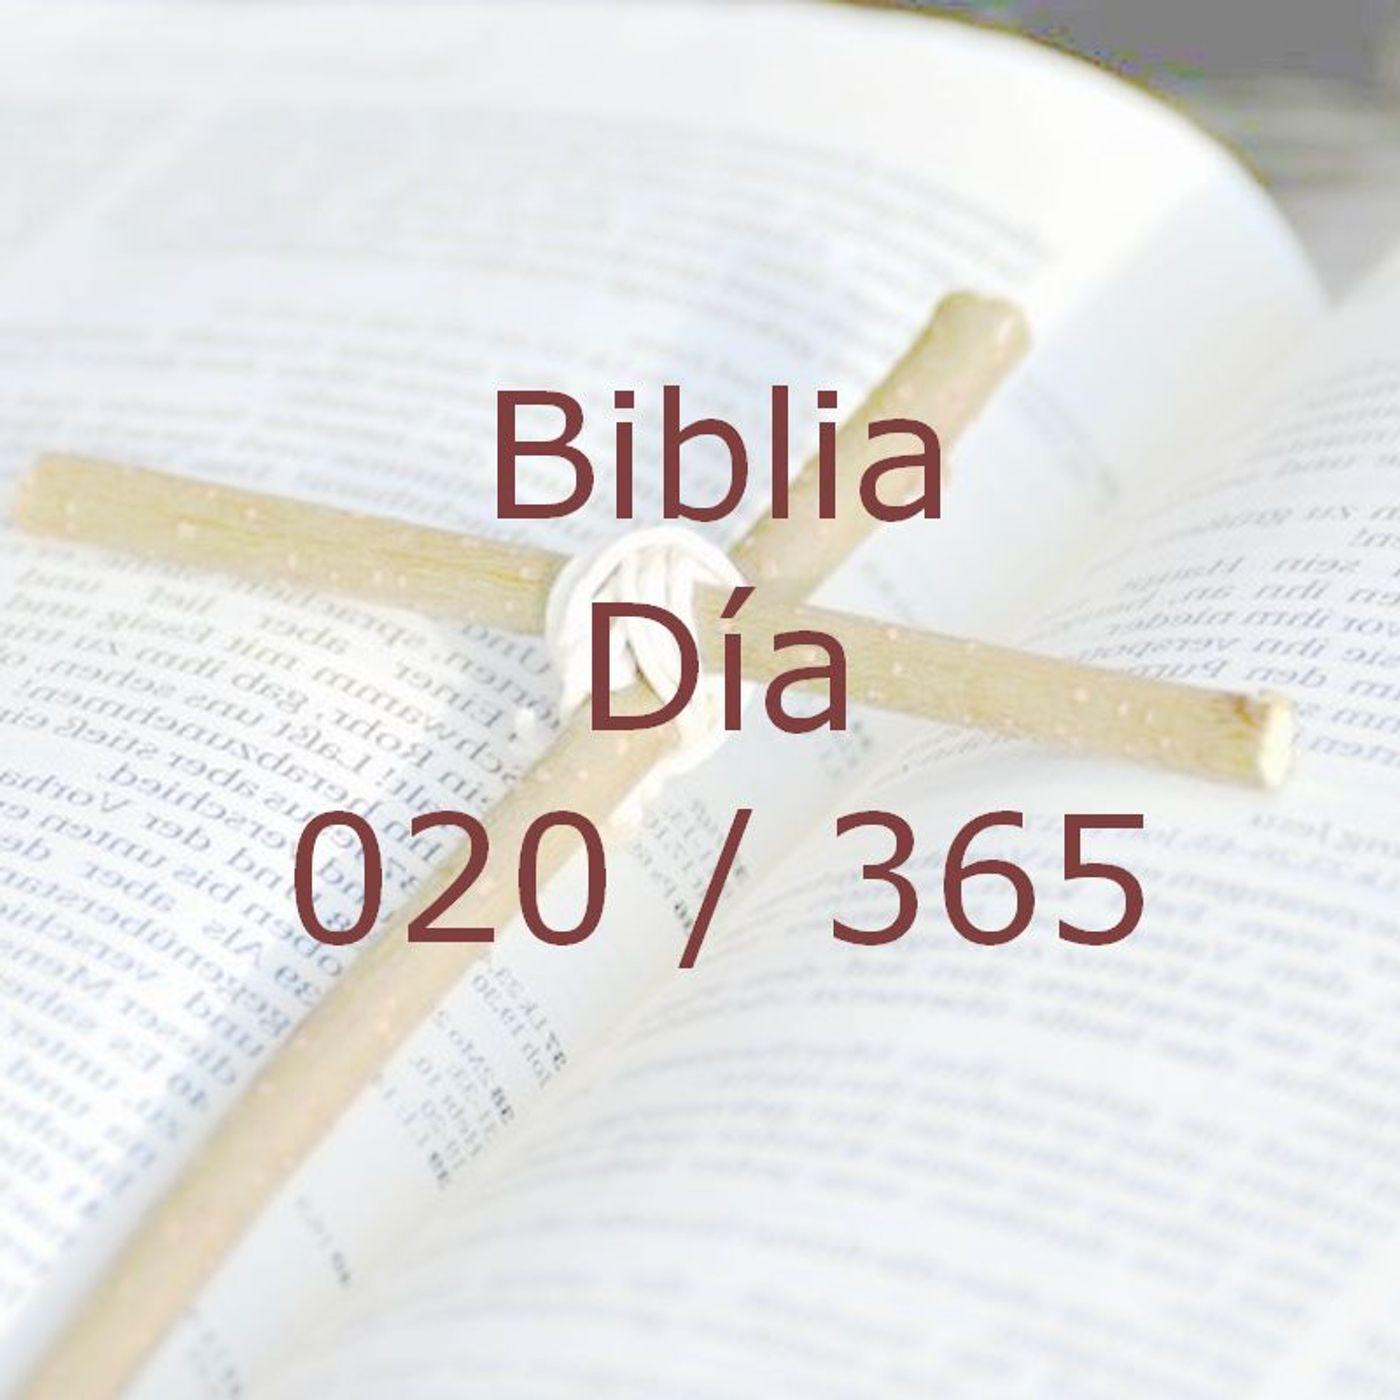 365 dias para la Biblia - Dia 020